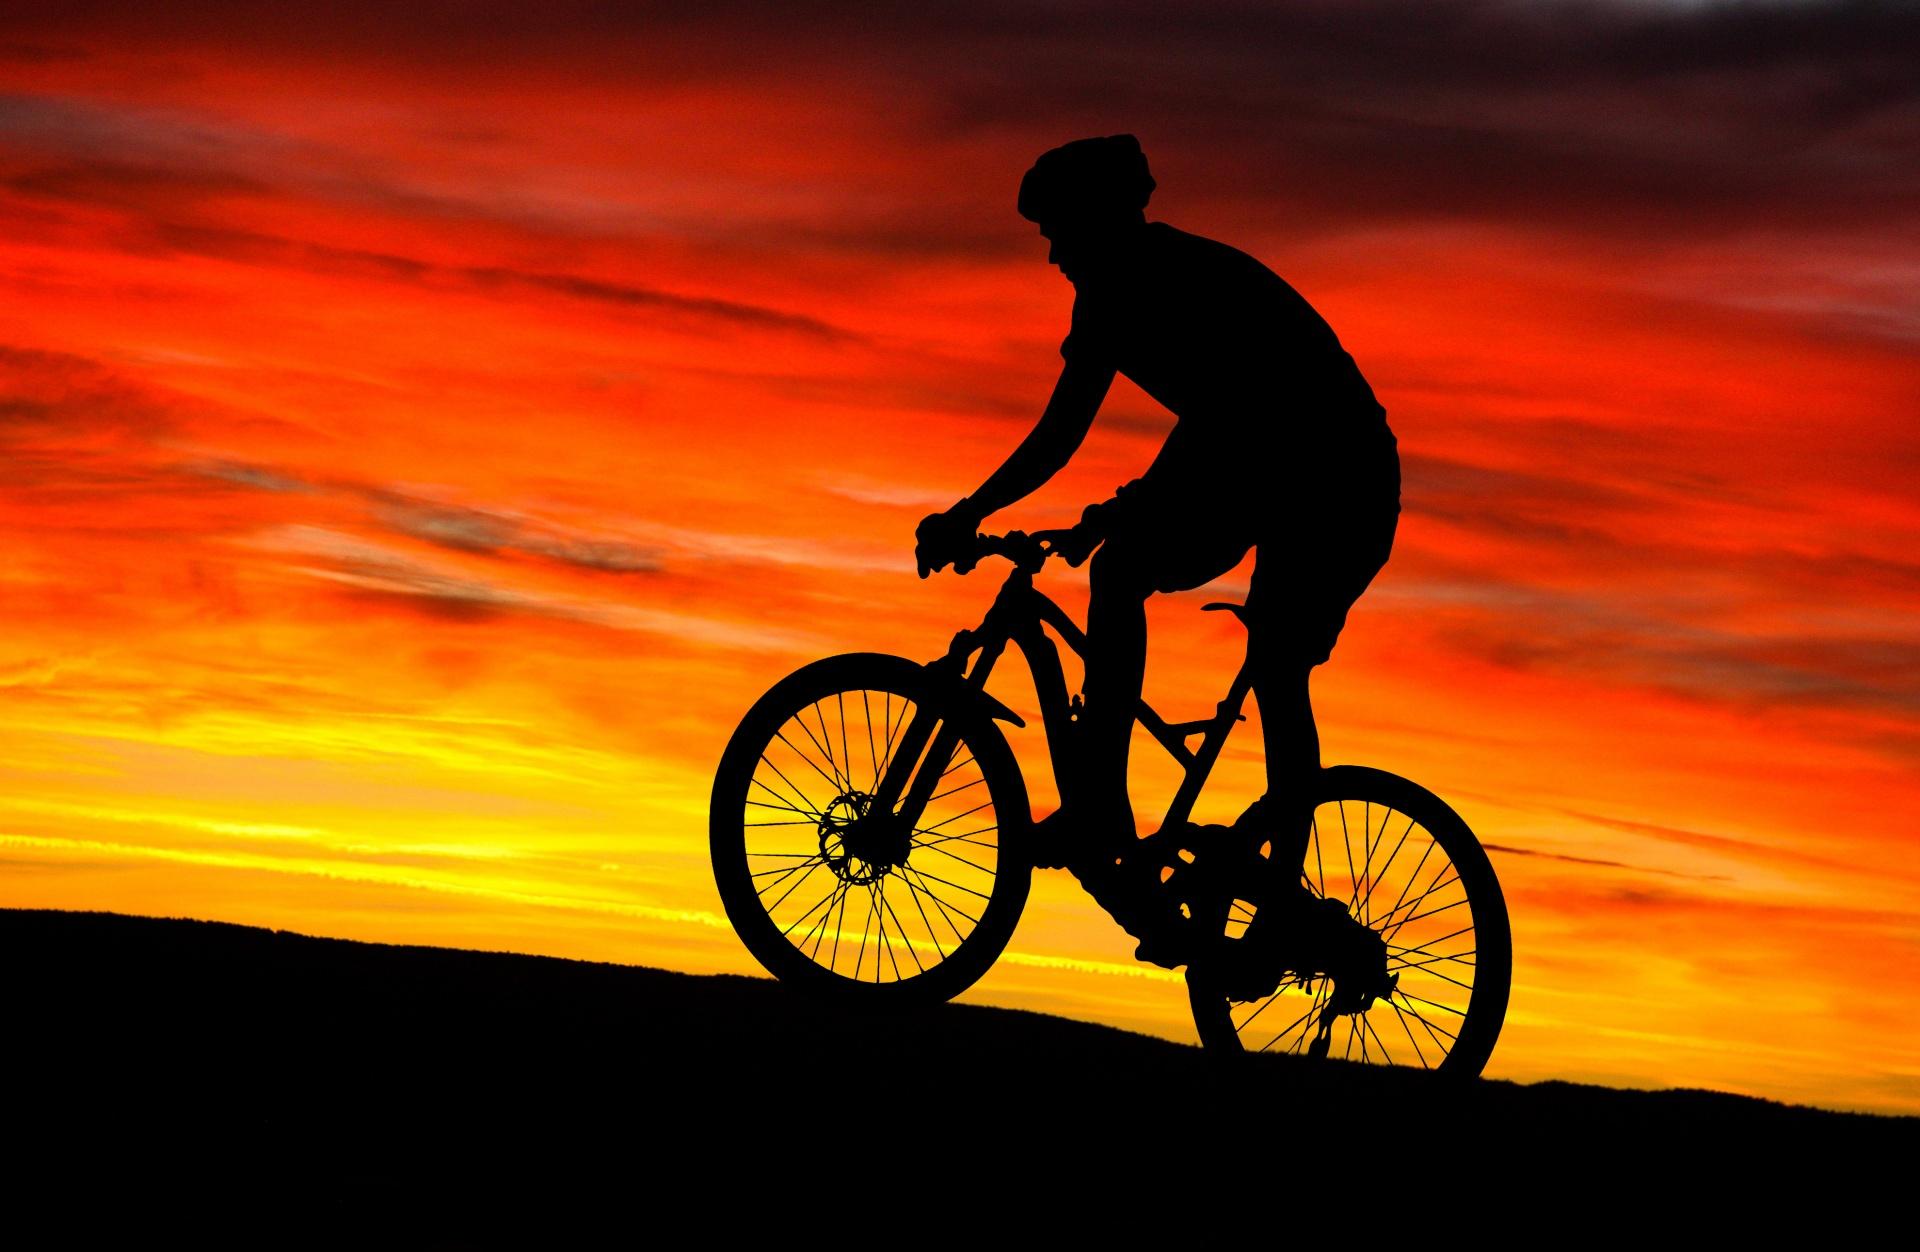 Mountain Bike Rider Sunset Free Stock Photo - Public Domain Pictures